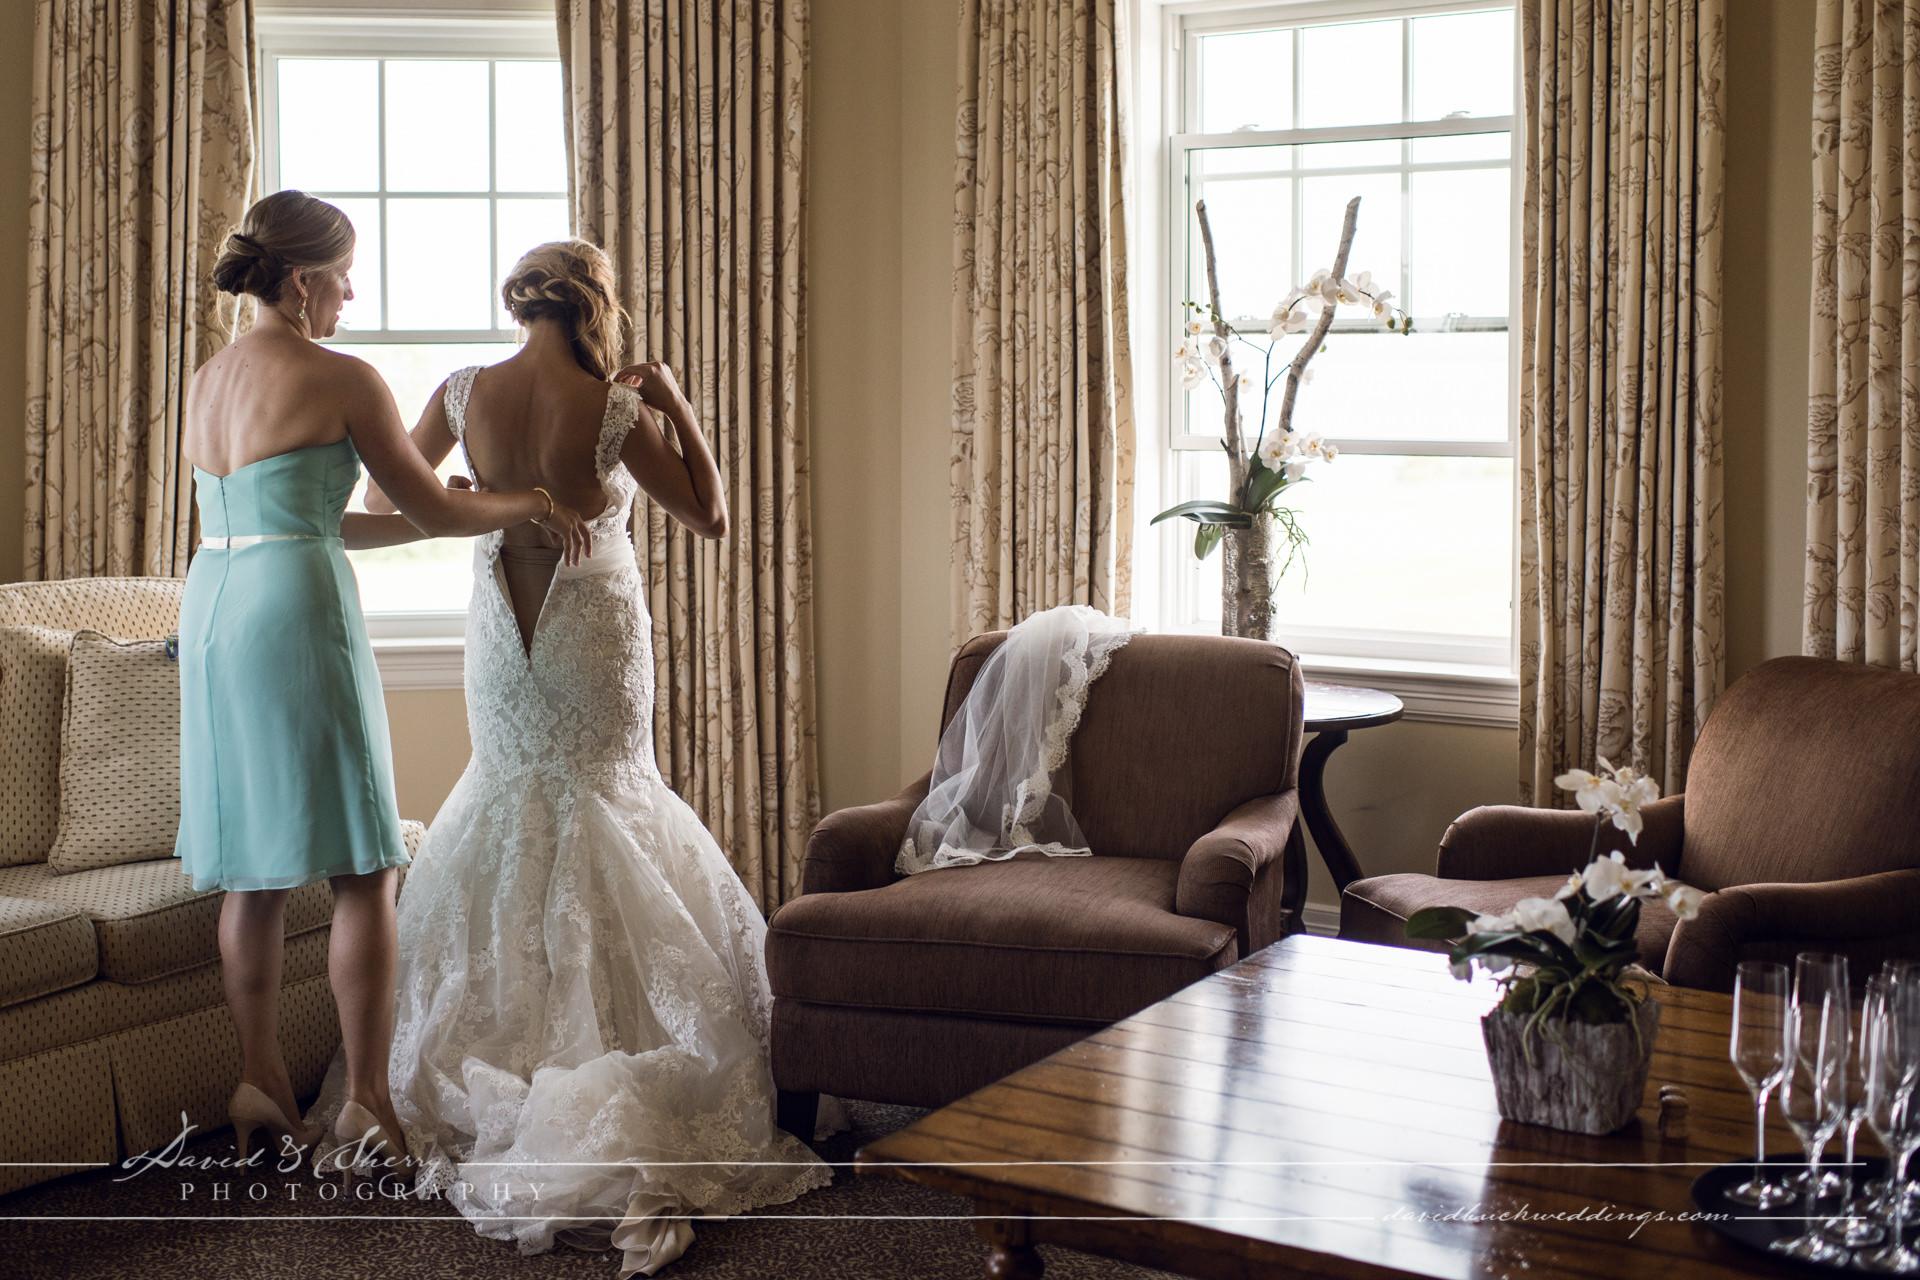 Cobble_Beach_Wedding_Photography_Owen_Sound_09